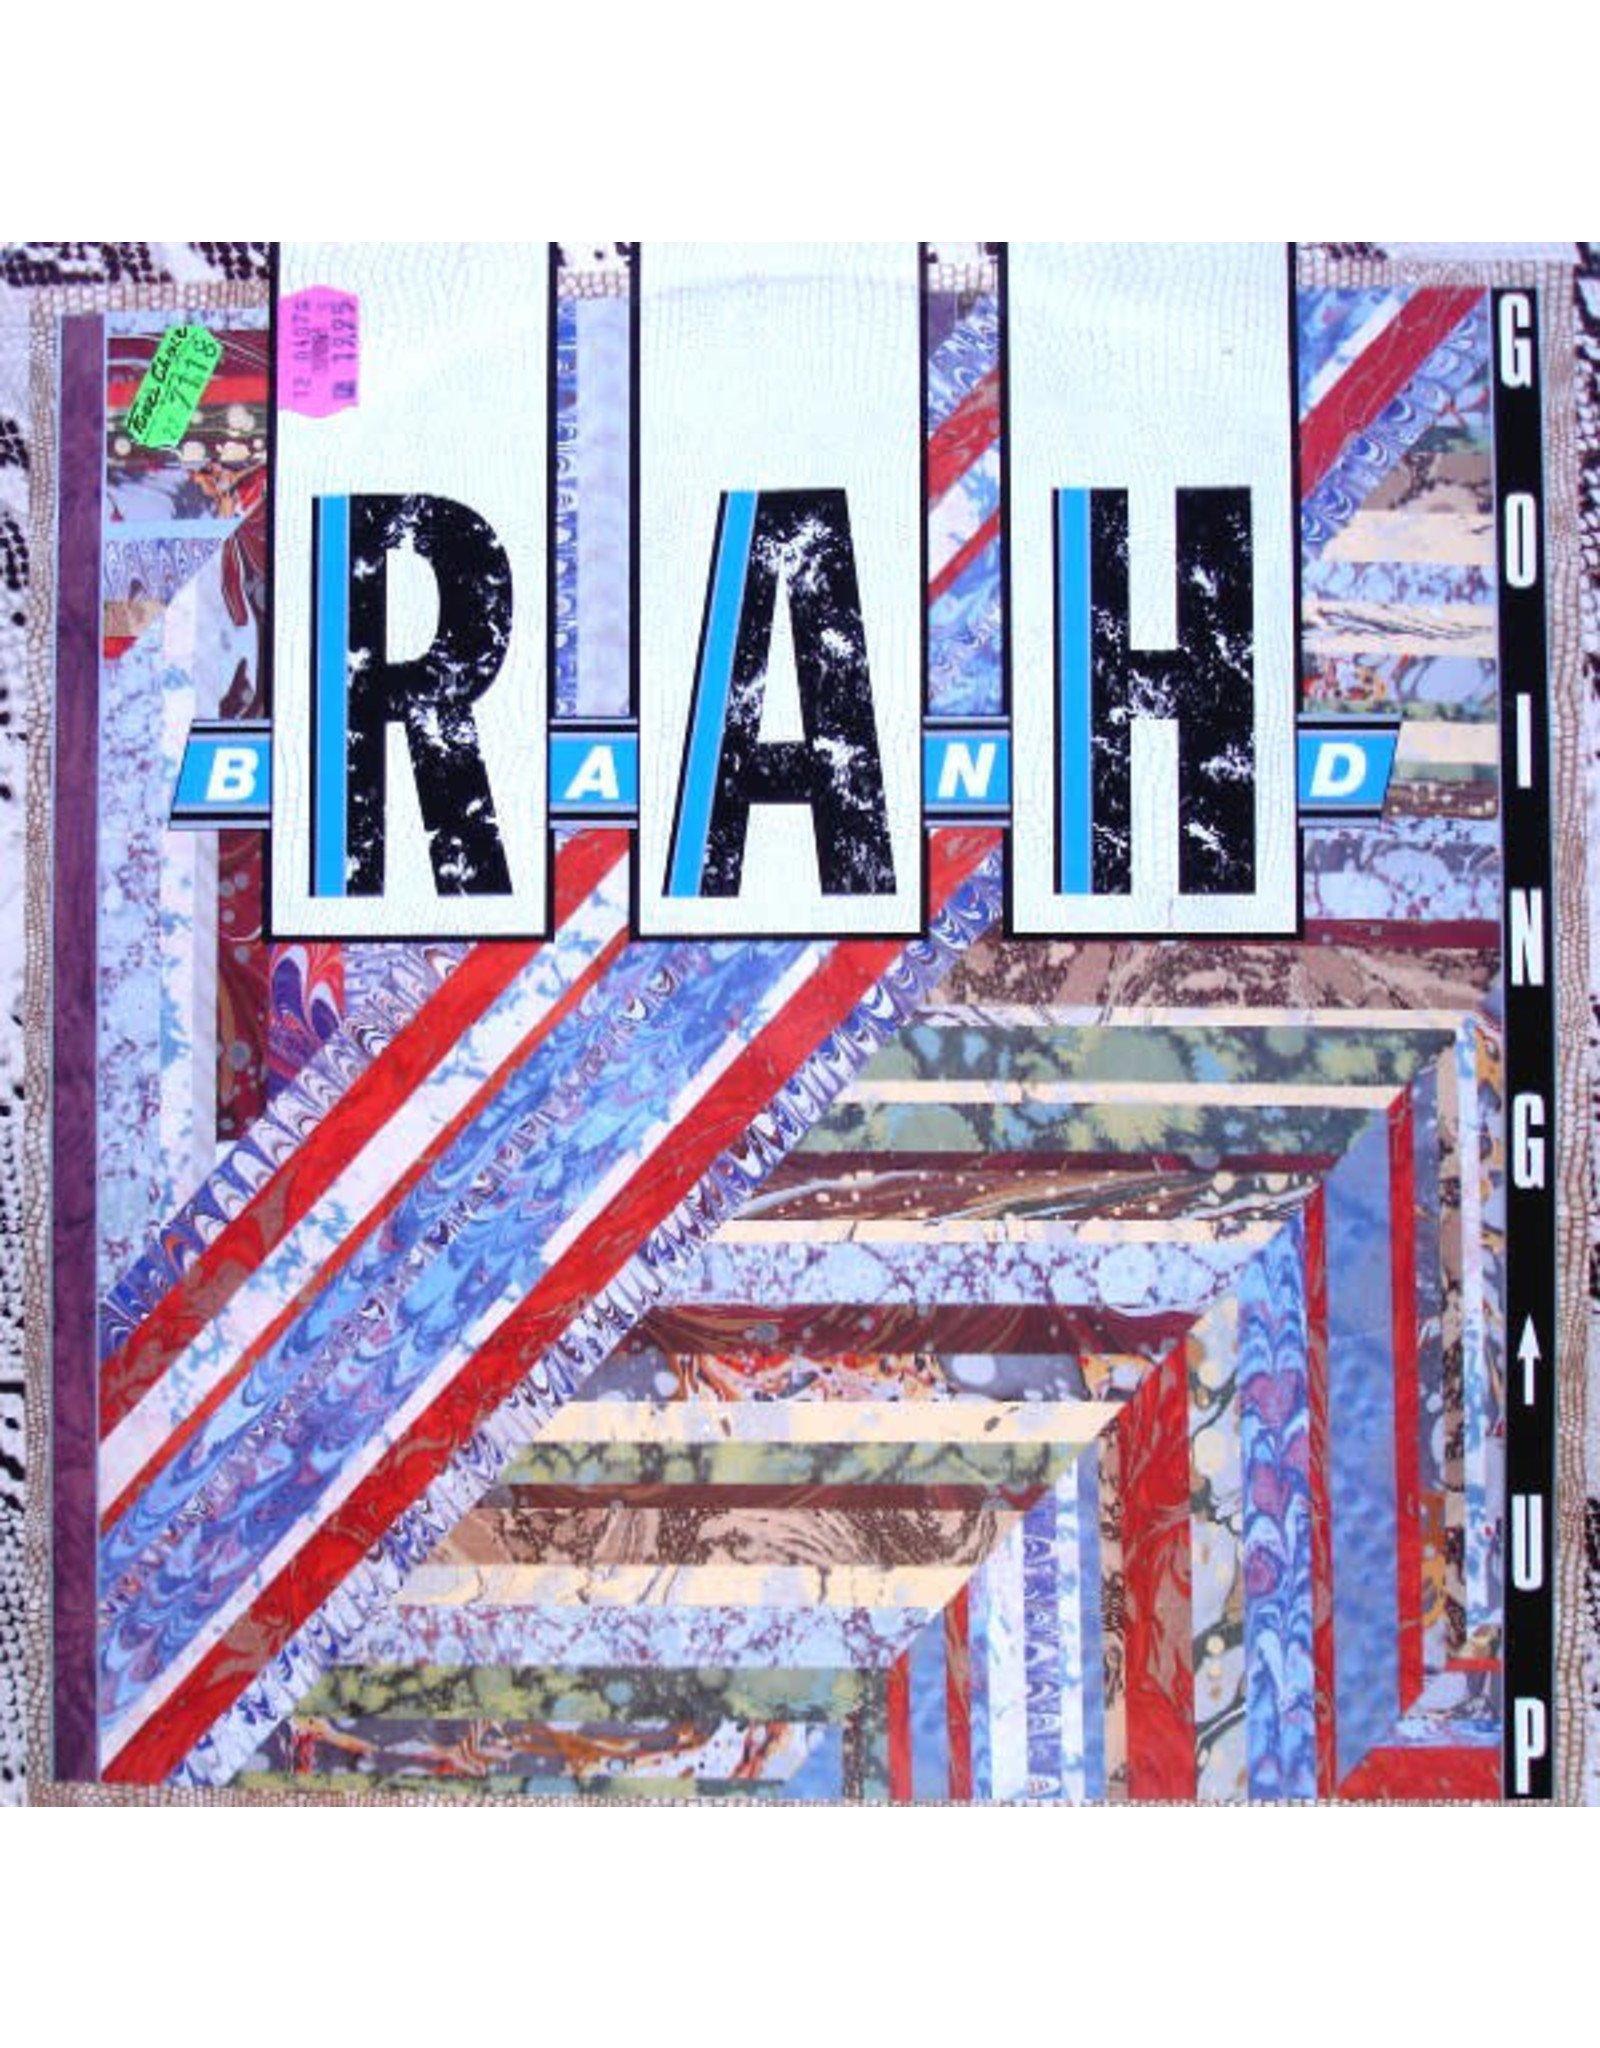 New Vinyl Rah Band - Going Up LP